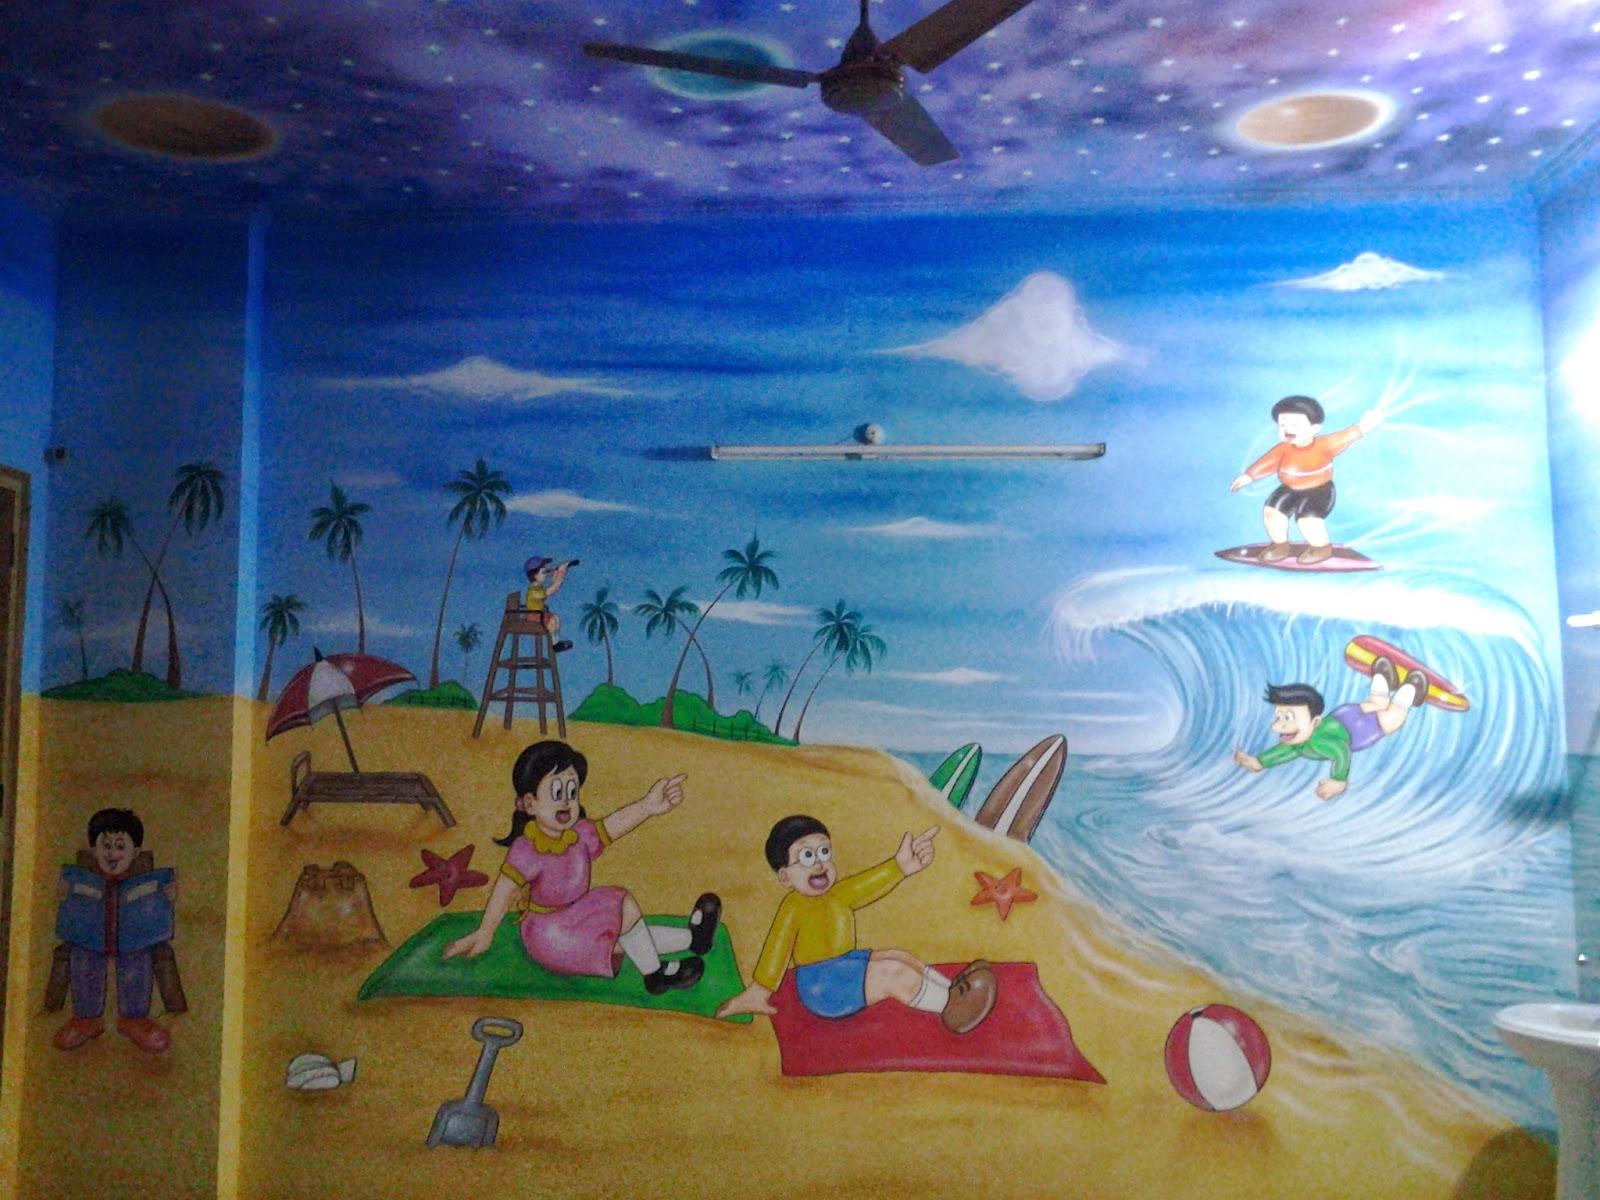 PLAY SCHOOL WALL PAINTING CARTOON PAINTING KIDS ROOM PAINTING 2014